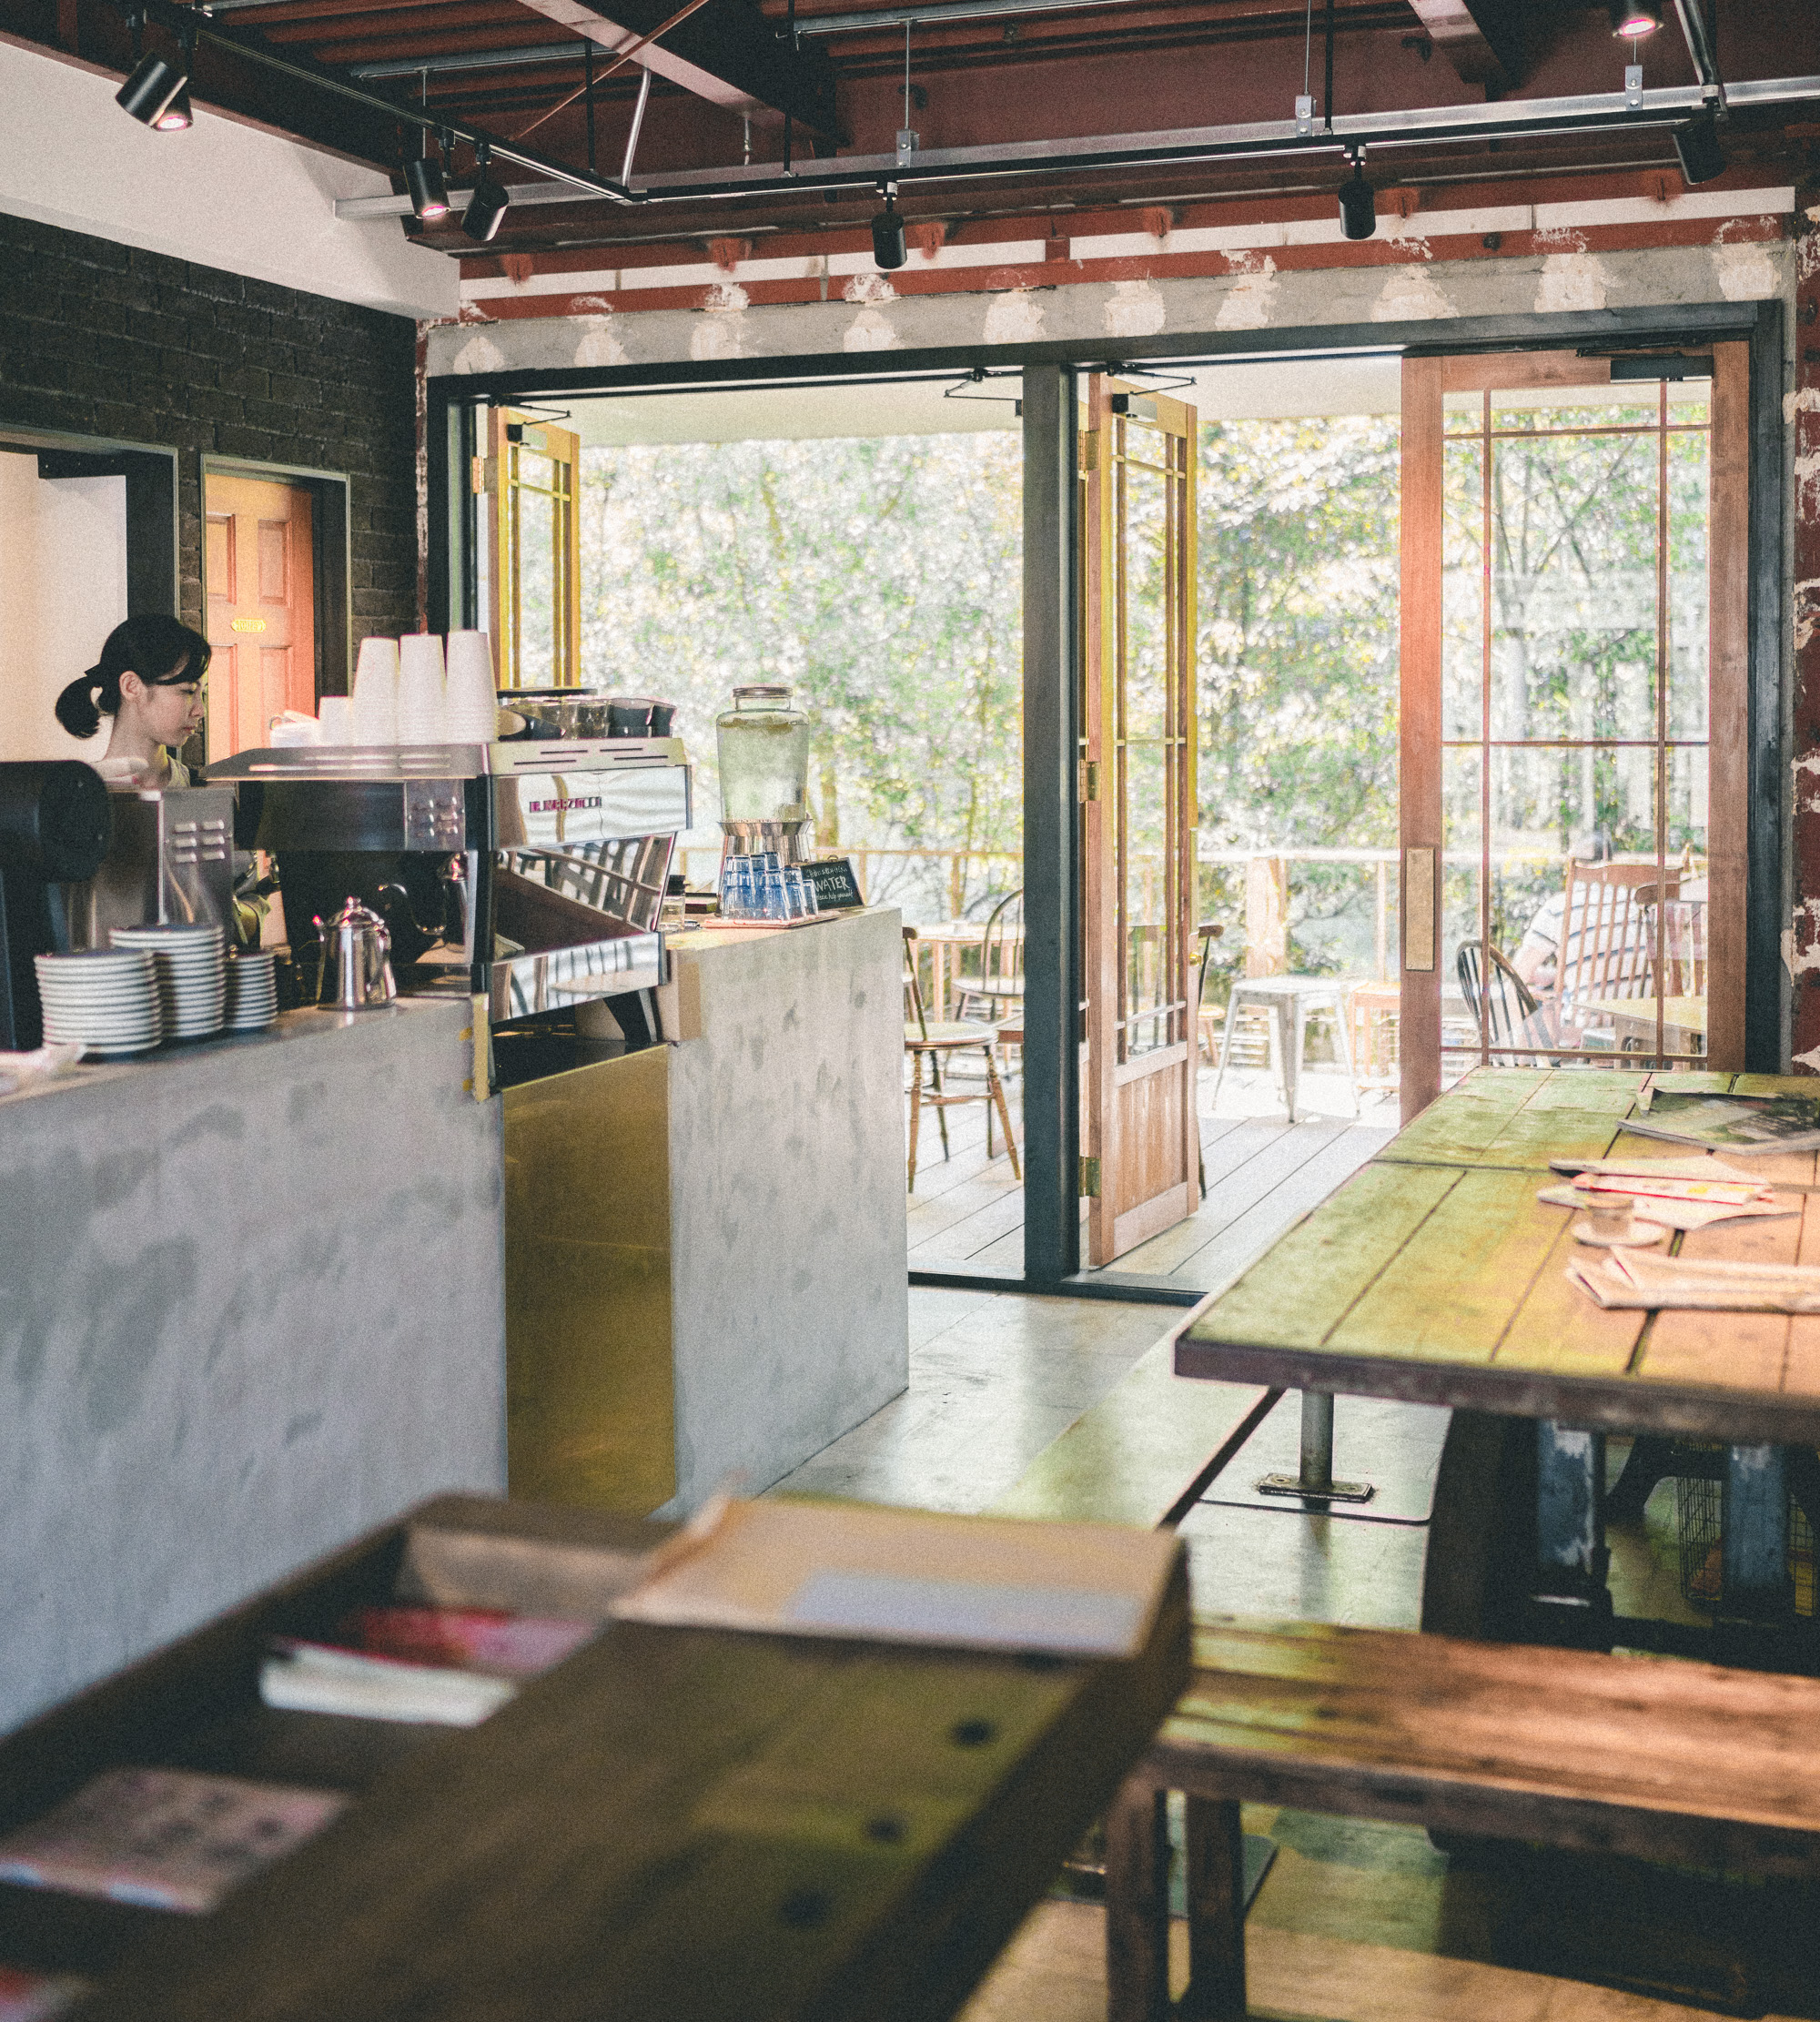 Vermillion Cafe for coffee and cake near Fushimi-Inari Taisha Shrine in Kyoto, Japan | 24 Hour Guide to Kyoto, Japan | 1 Day Guide Kyoto | Kyoto City Guide | Kyoto Travel Itinerary